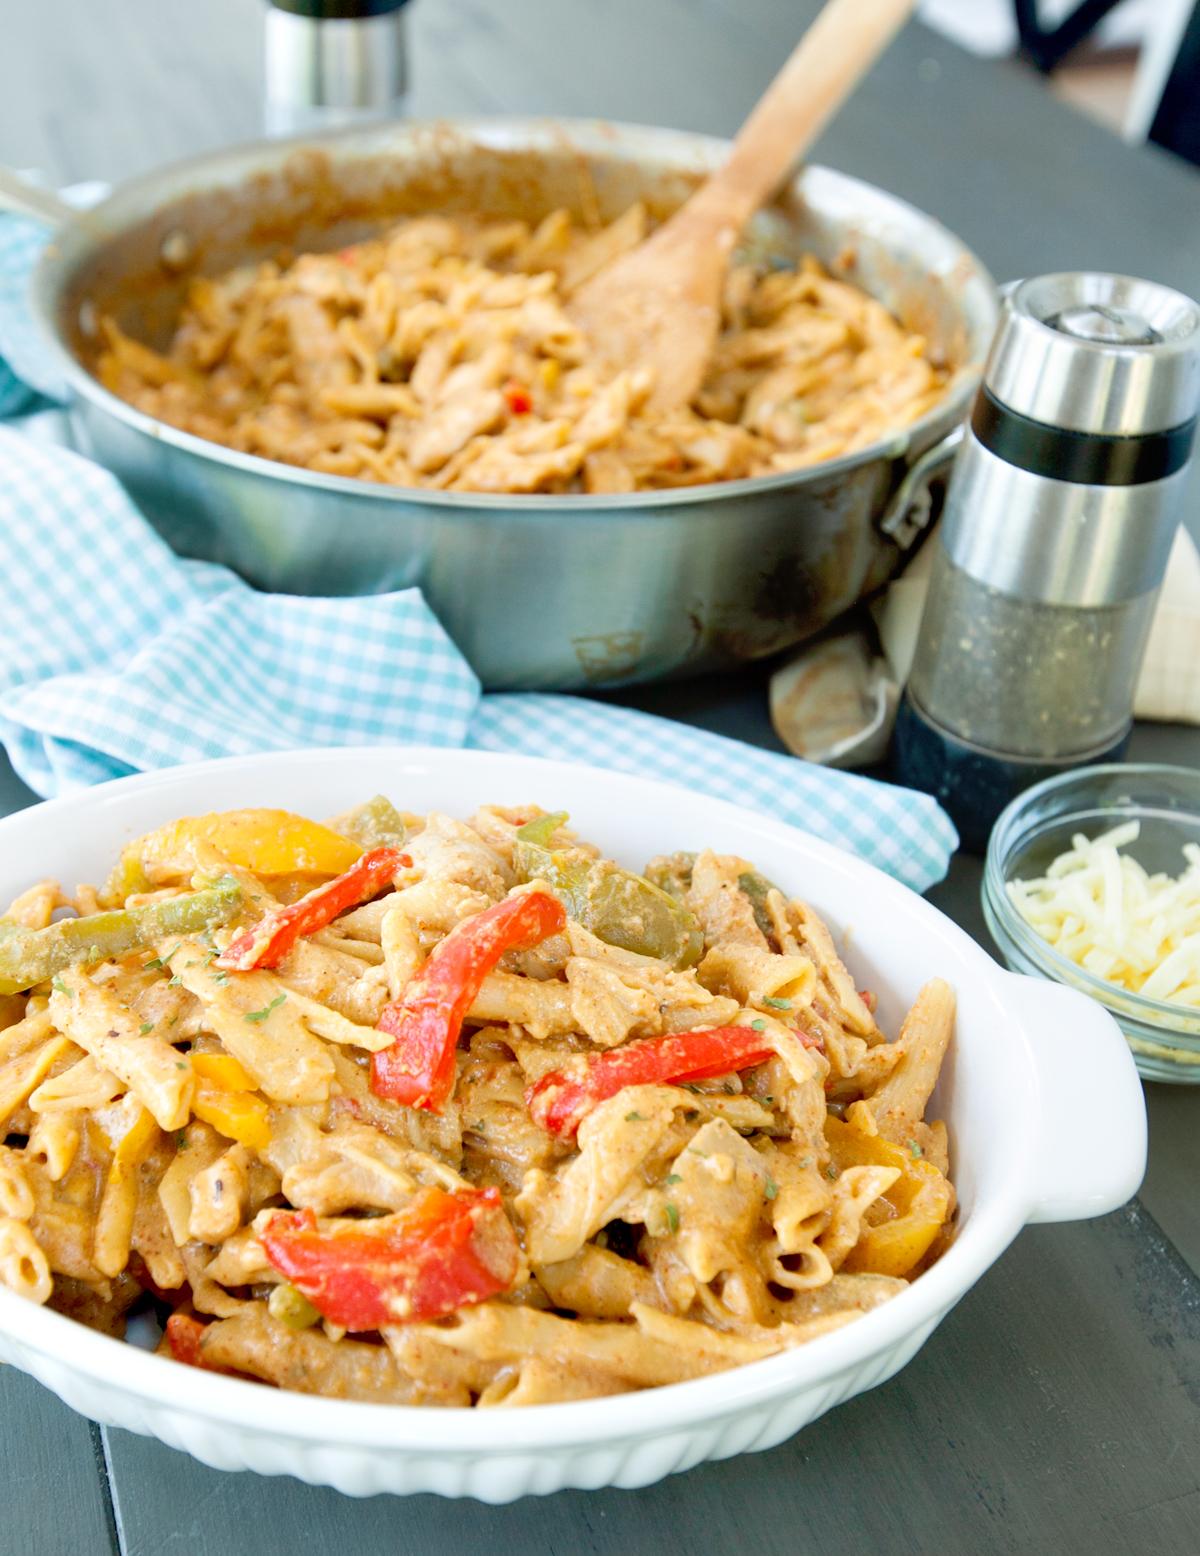 chicken fajita pasta in a serving dish